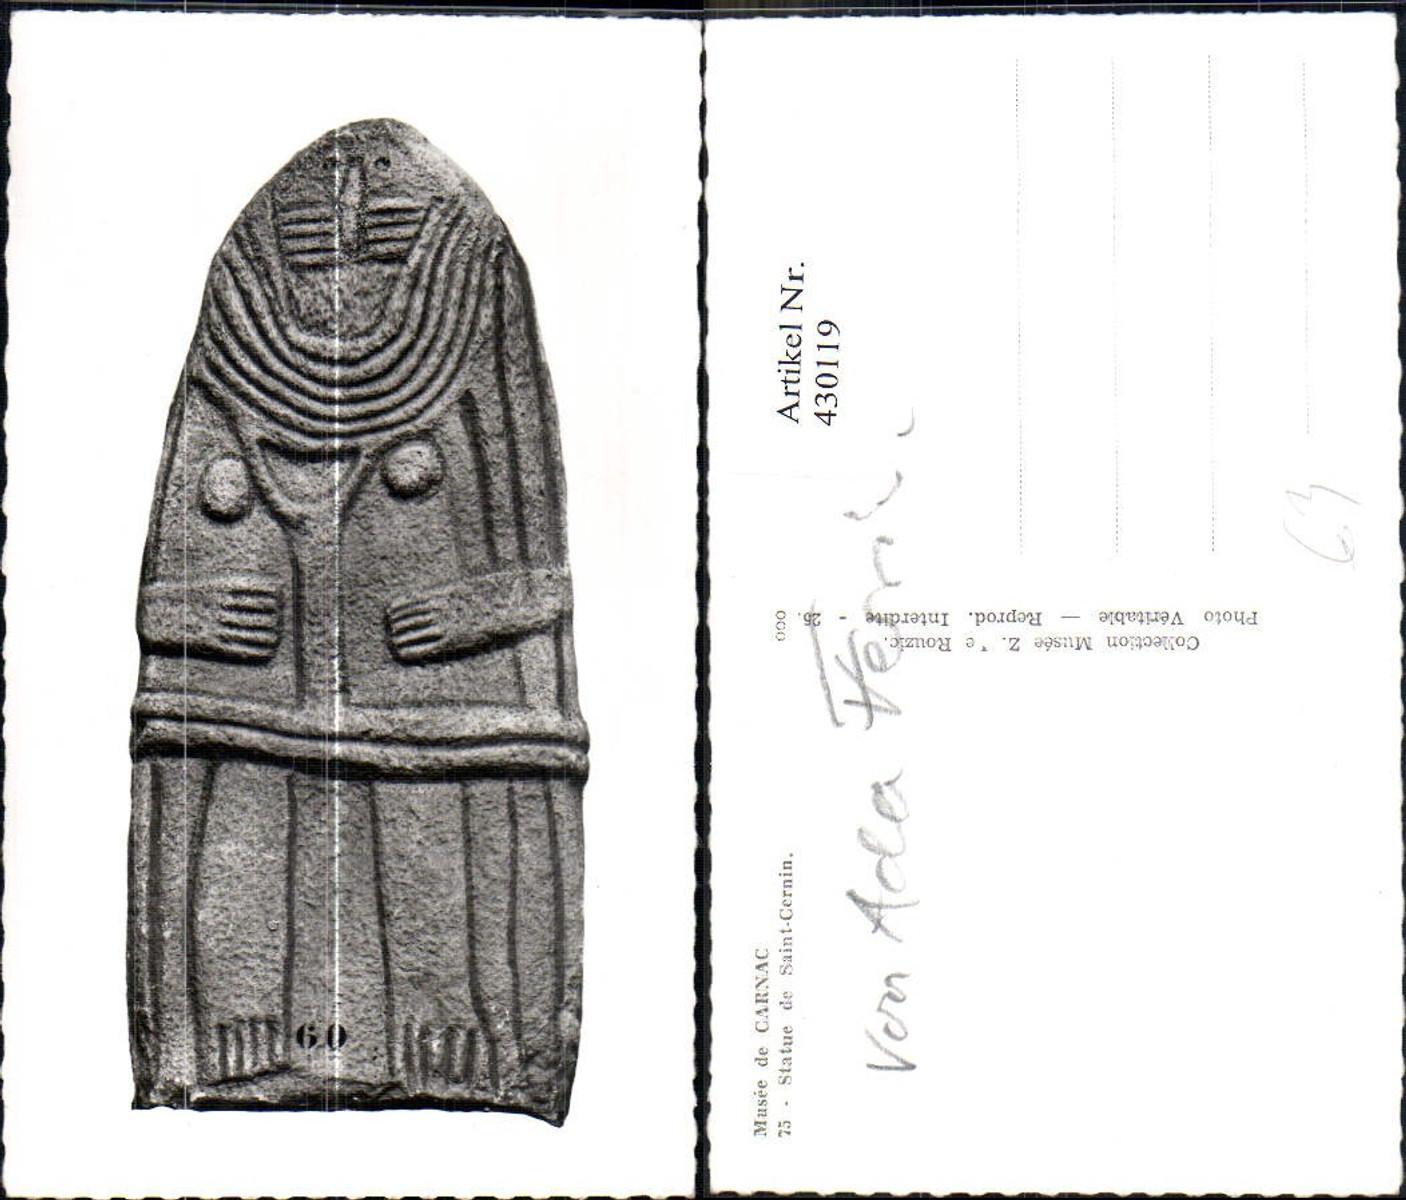 430119,Foto Ak Archäologie Musee de Carnac Statue de Saint-Cernin günstig online kaufen